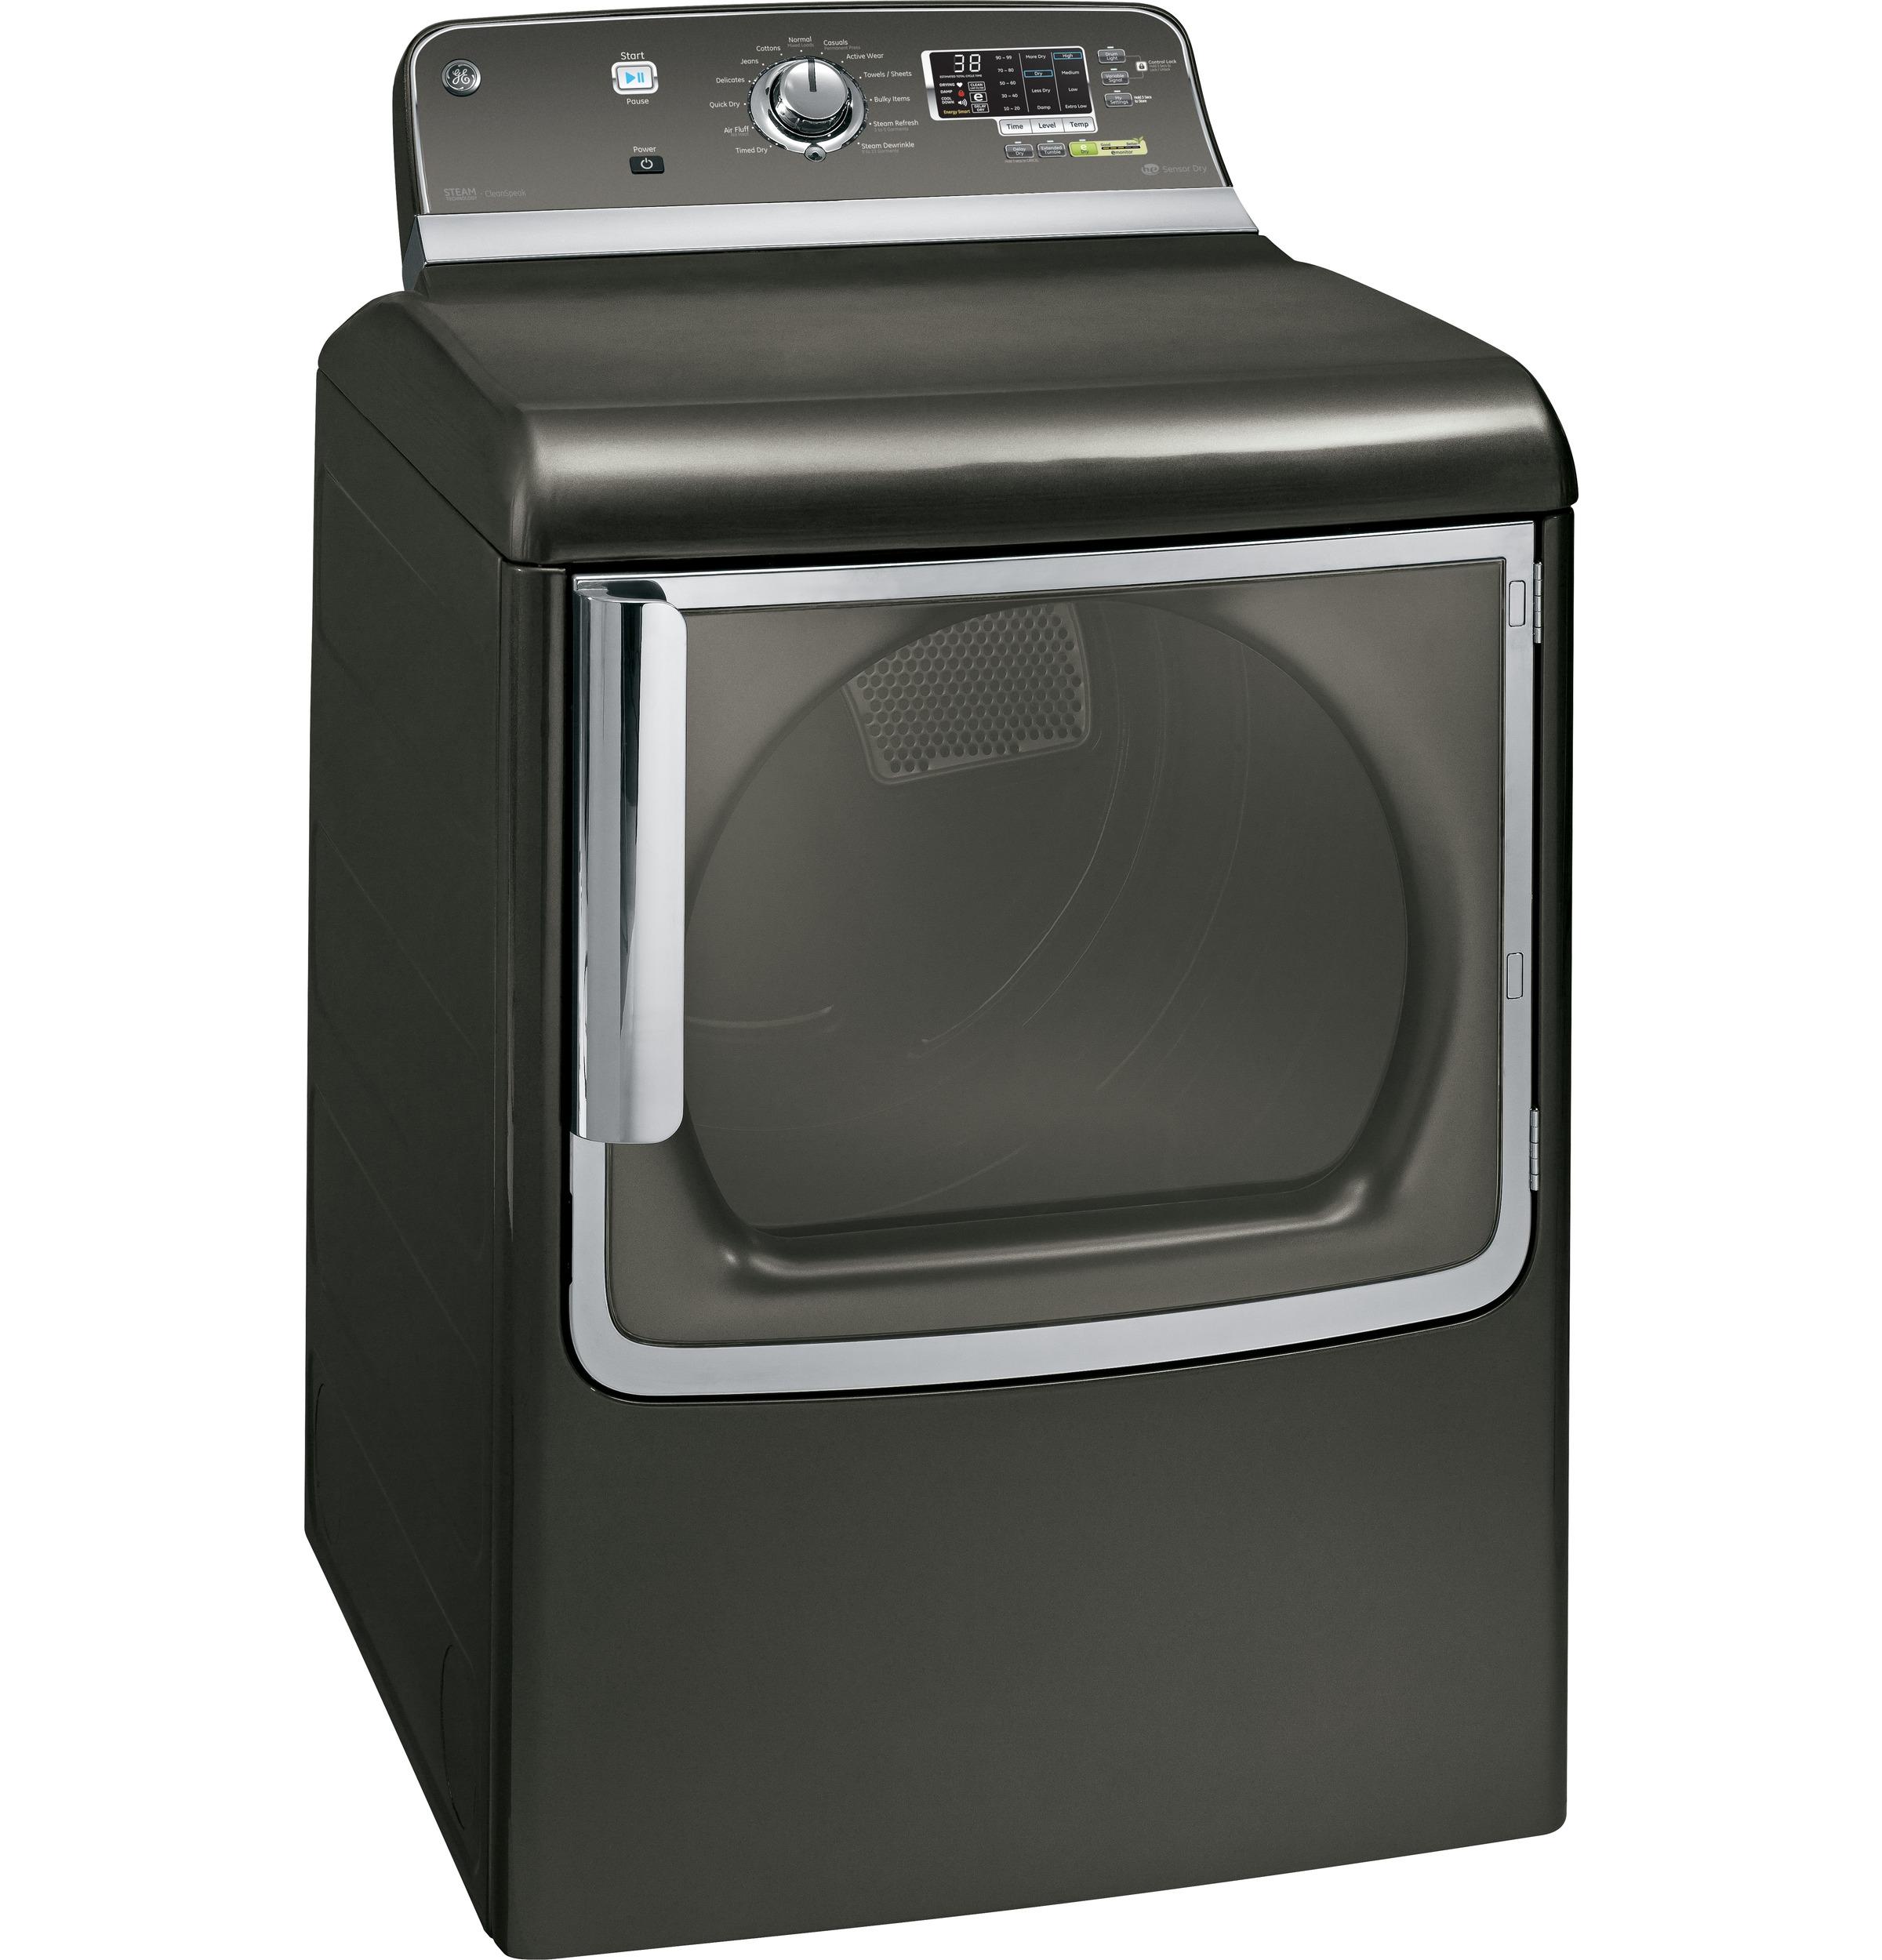 GE 7.8 cu. ft. Steam Gas Dryer w/ Stainless Steel Drum - Metallic Carbon